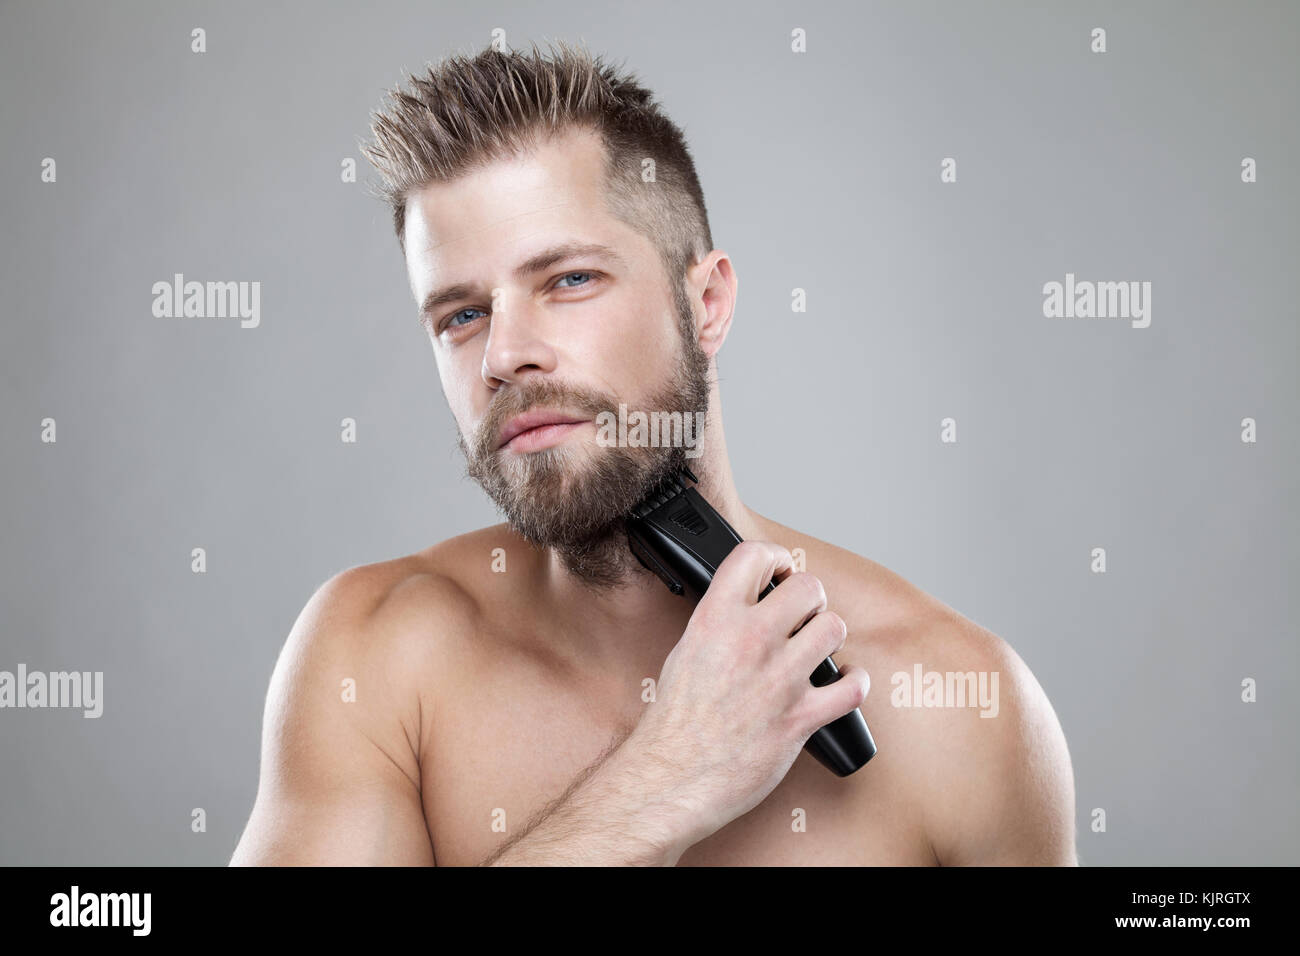 trimmer män